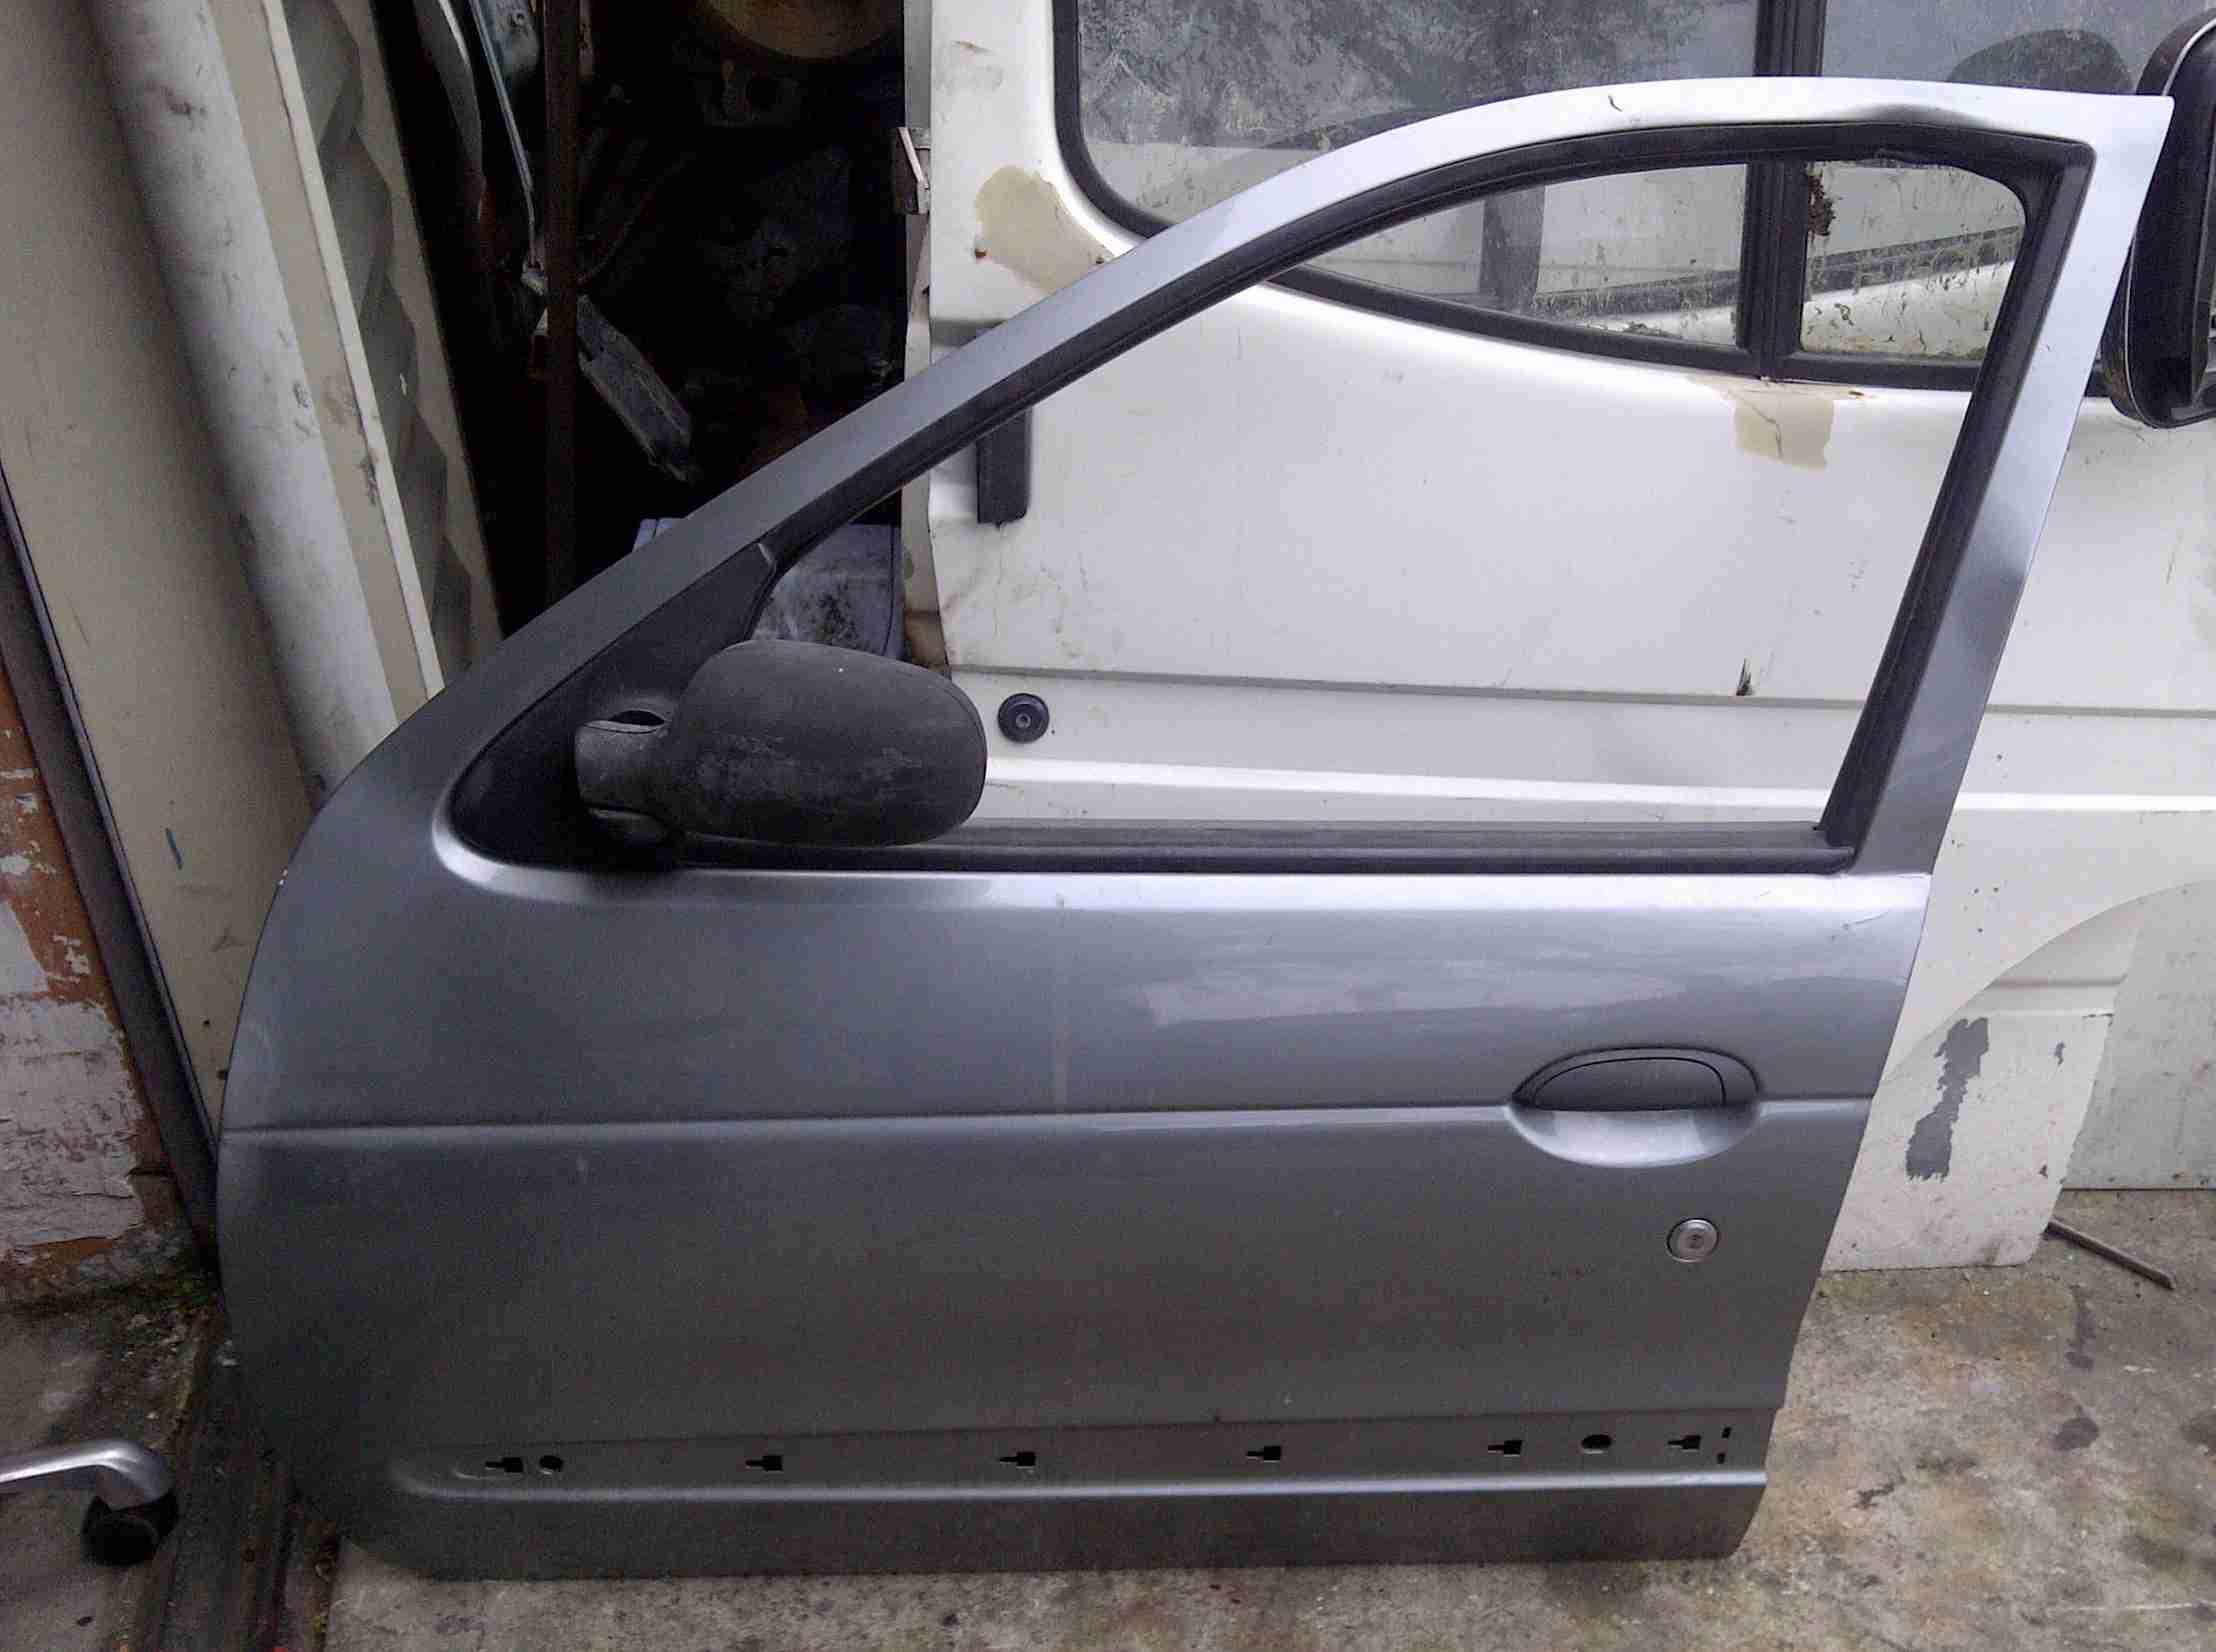 Ankara Ostim Volkswagen Otomotiv Mugla Renault Master 2 3 Dci L4h2 Cikma Yedek Parca Renault Master Sol On Kapi